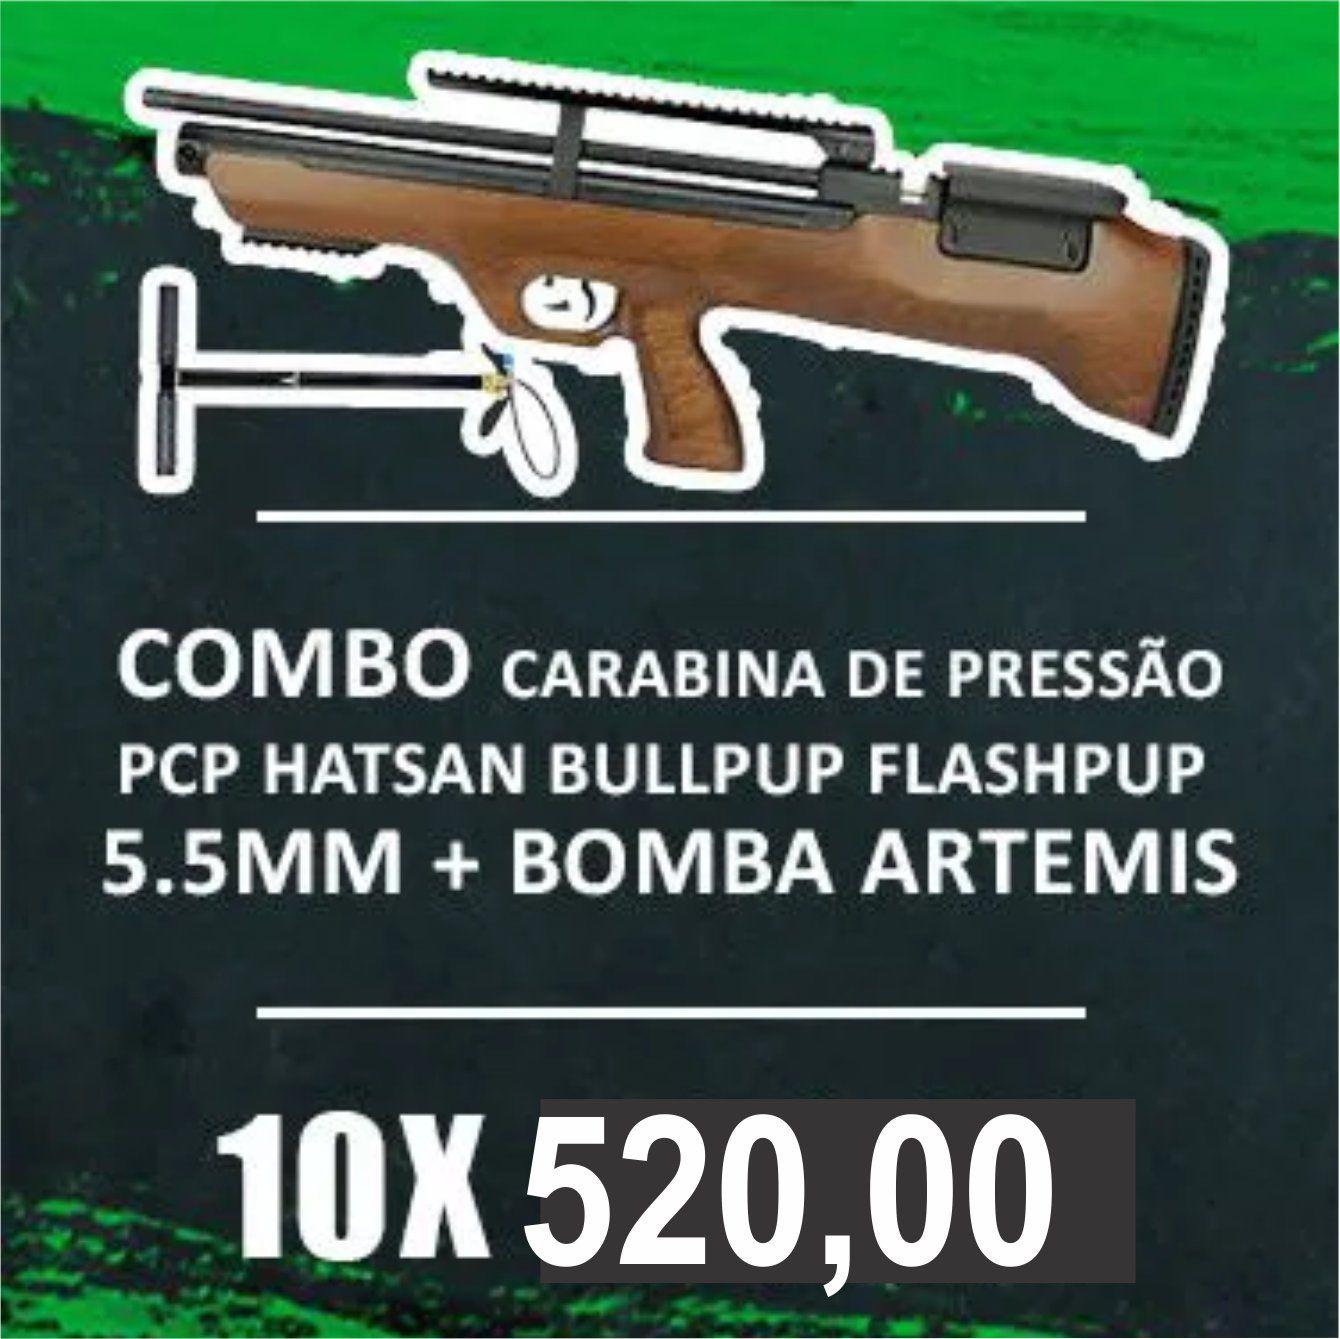 Consórcio - Carabina Hatsan PCP Bullpup Flashpup 12 tiros 5.5mm + Bomba Artemis